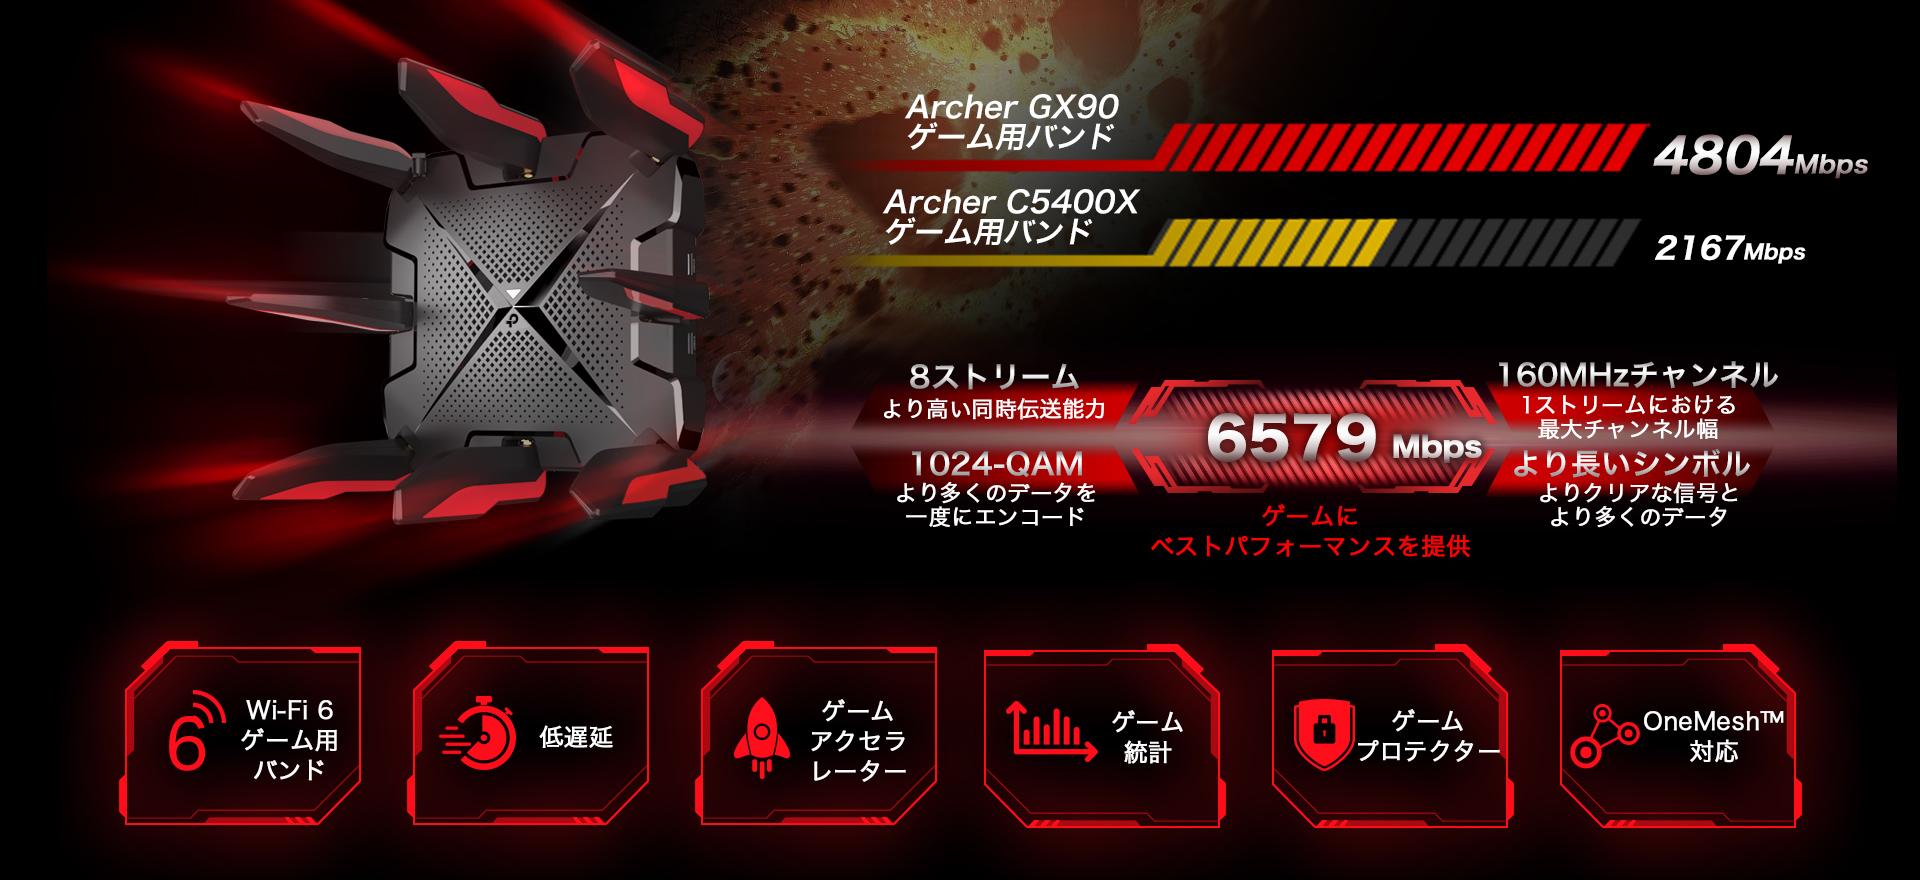 Archer GX90」